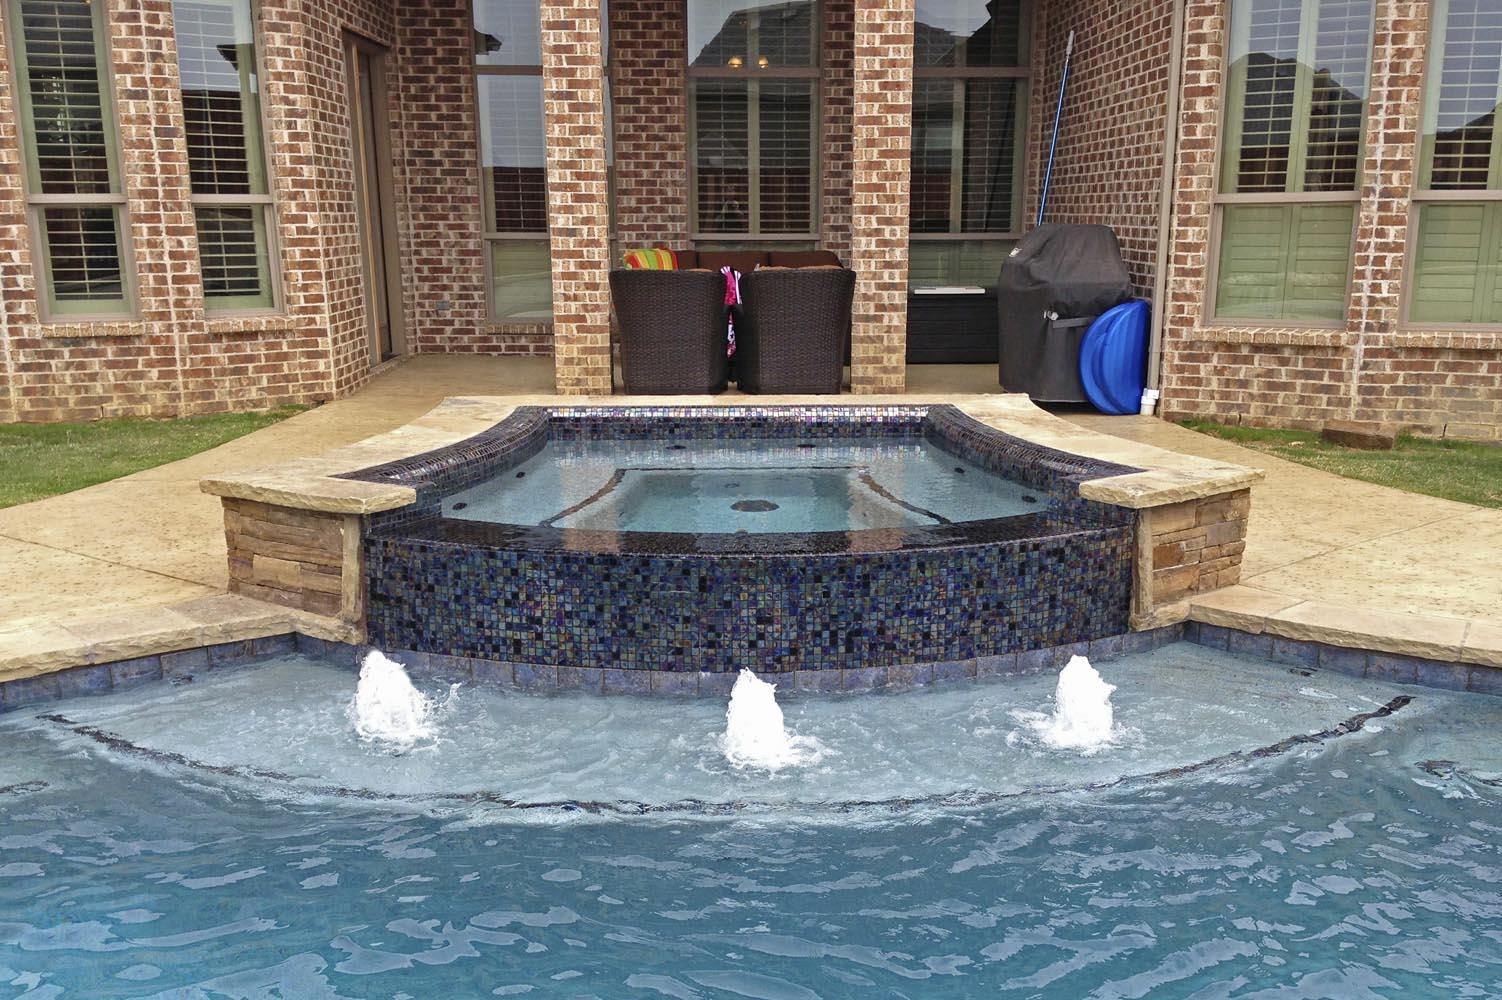 Water Pool Tiles : Custom inground spa design gallery photos dallas frisco